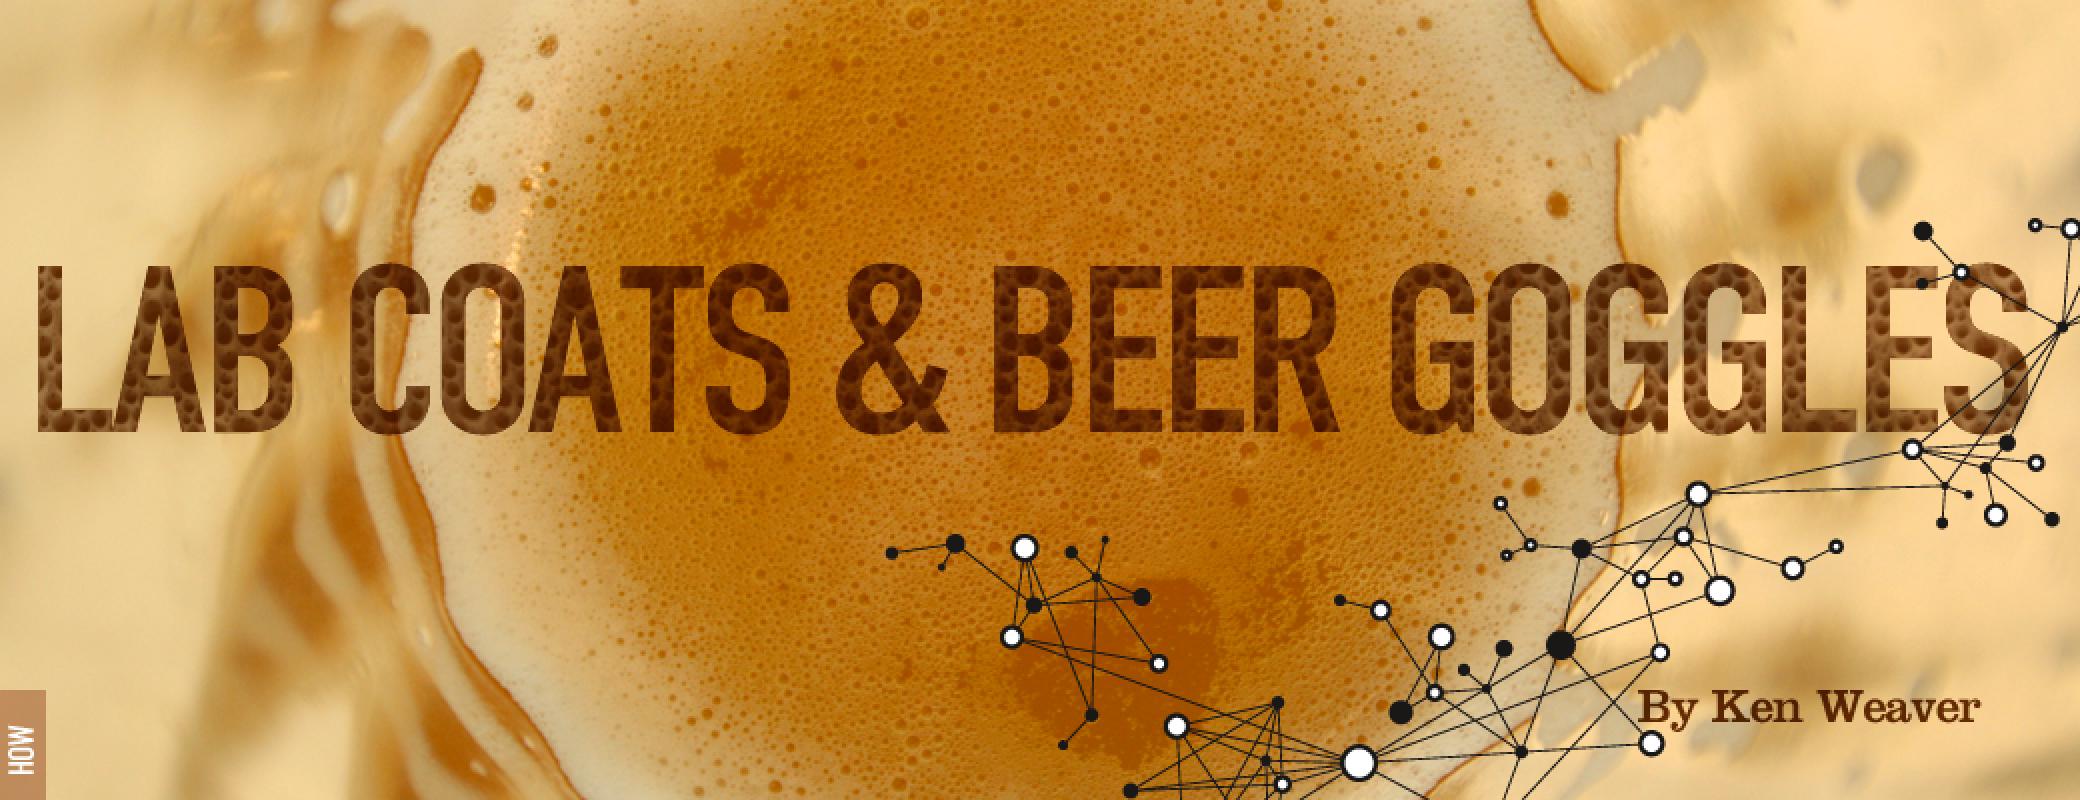 lab-coat-and-beer-goggles-by-ken-weaver@2x.jpg